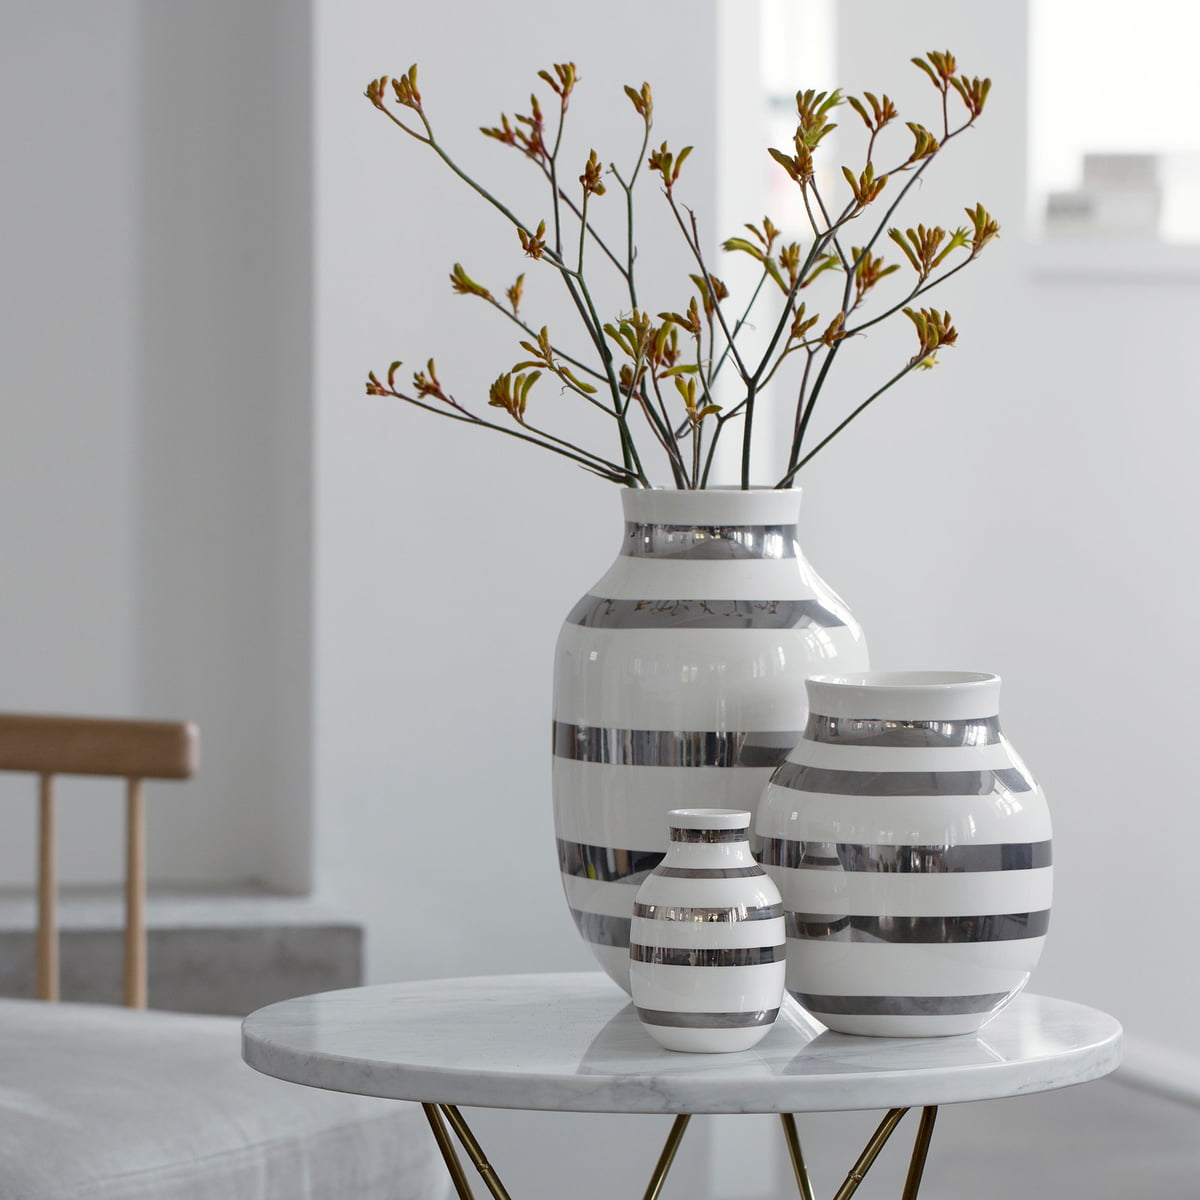 kähler design The Omaggio vase H20 cm by Kähler Design kähler design